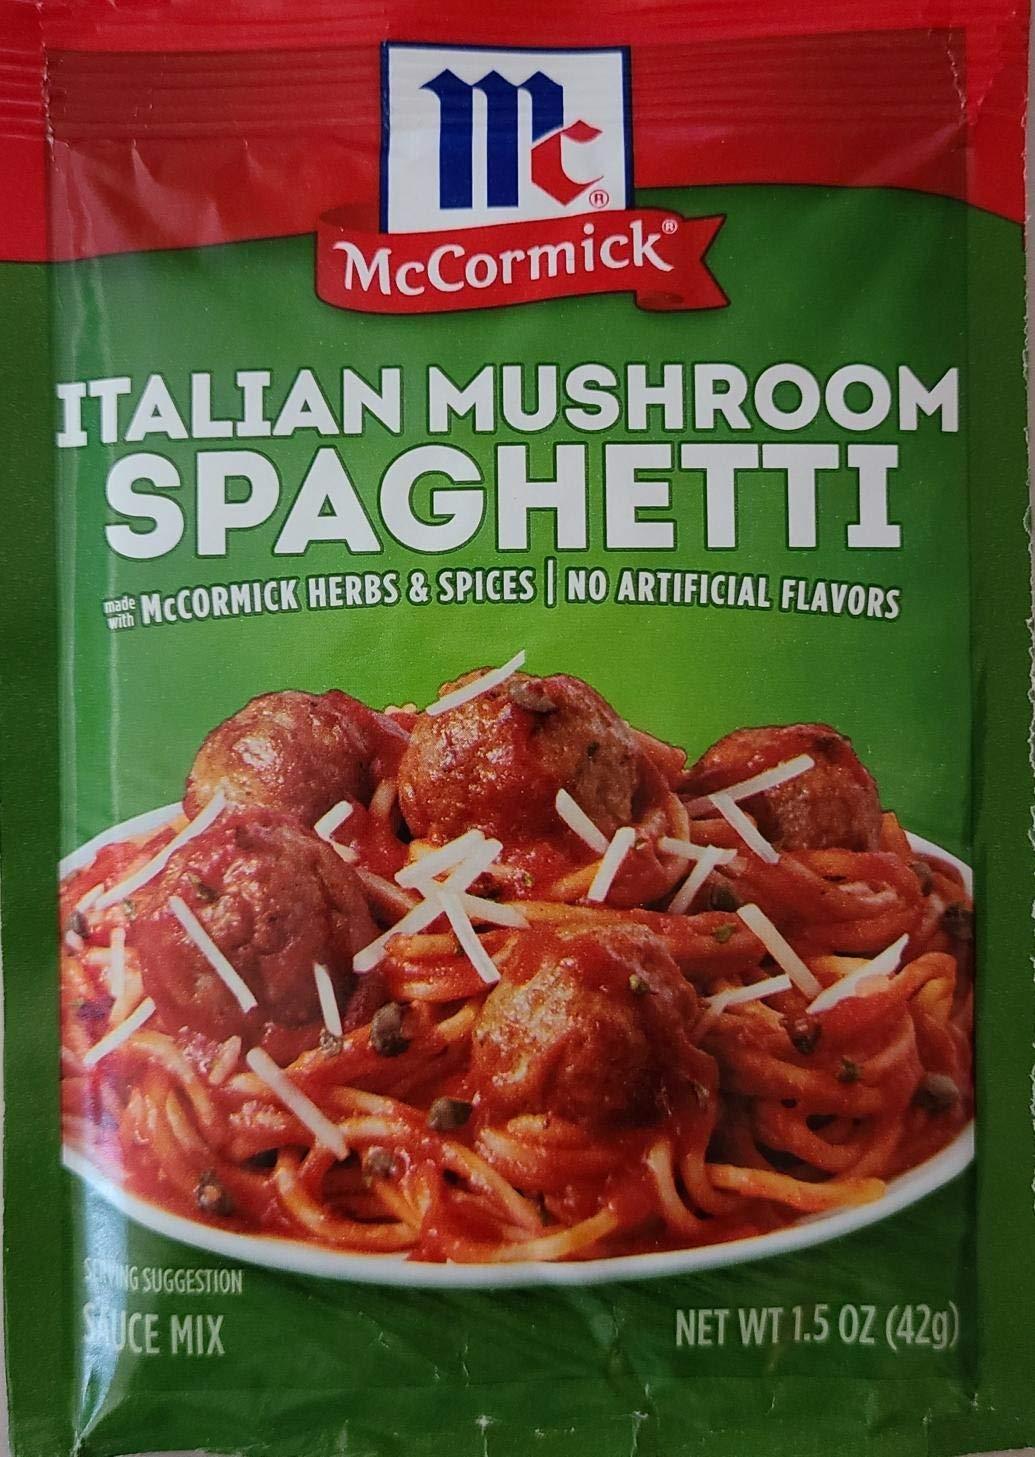 Cheap sale Mccormic Italian Mushroom Spaghetti Sauce 2021new shipping free shipping 1.5oz Pack of Mix 3